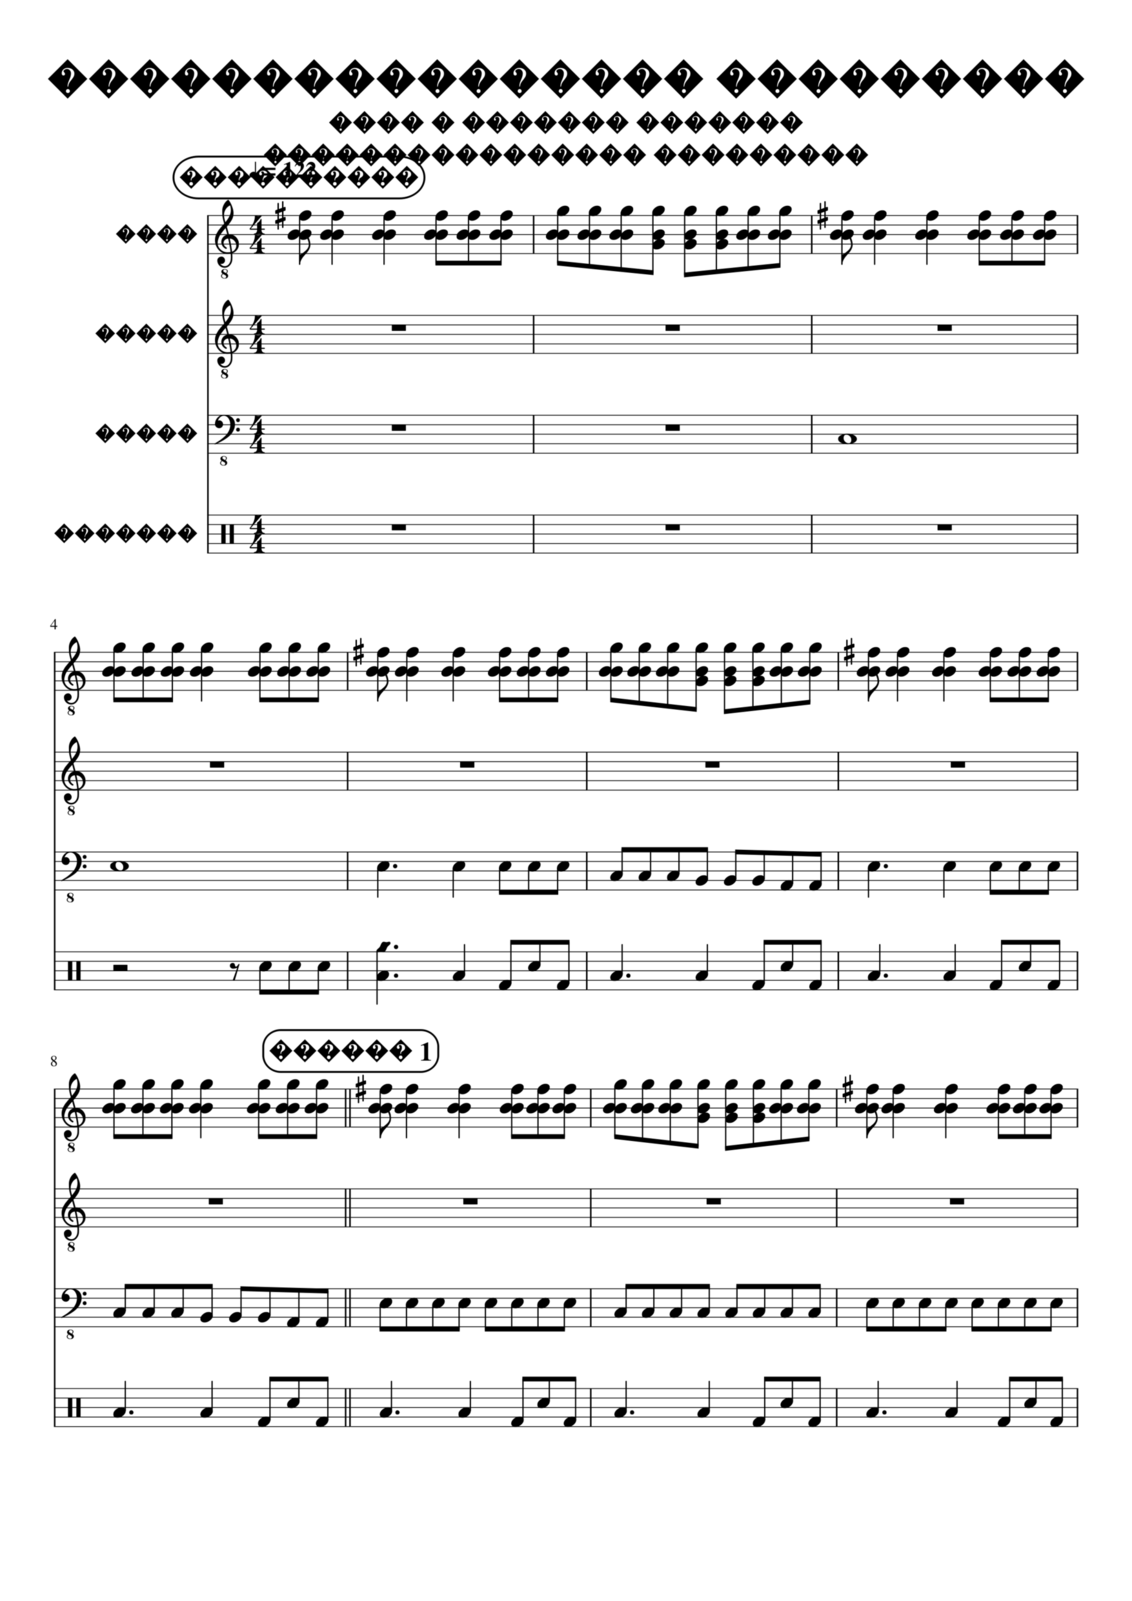 Deklassirovannyim elementam slide, Image 1